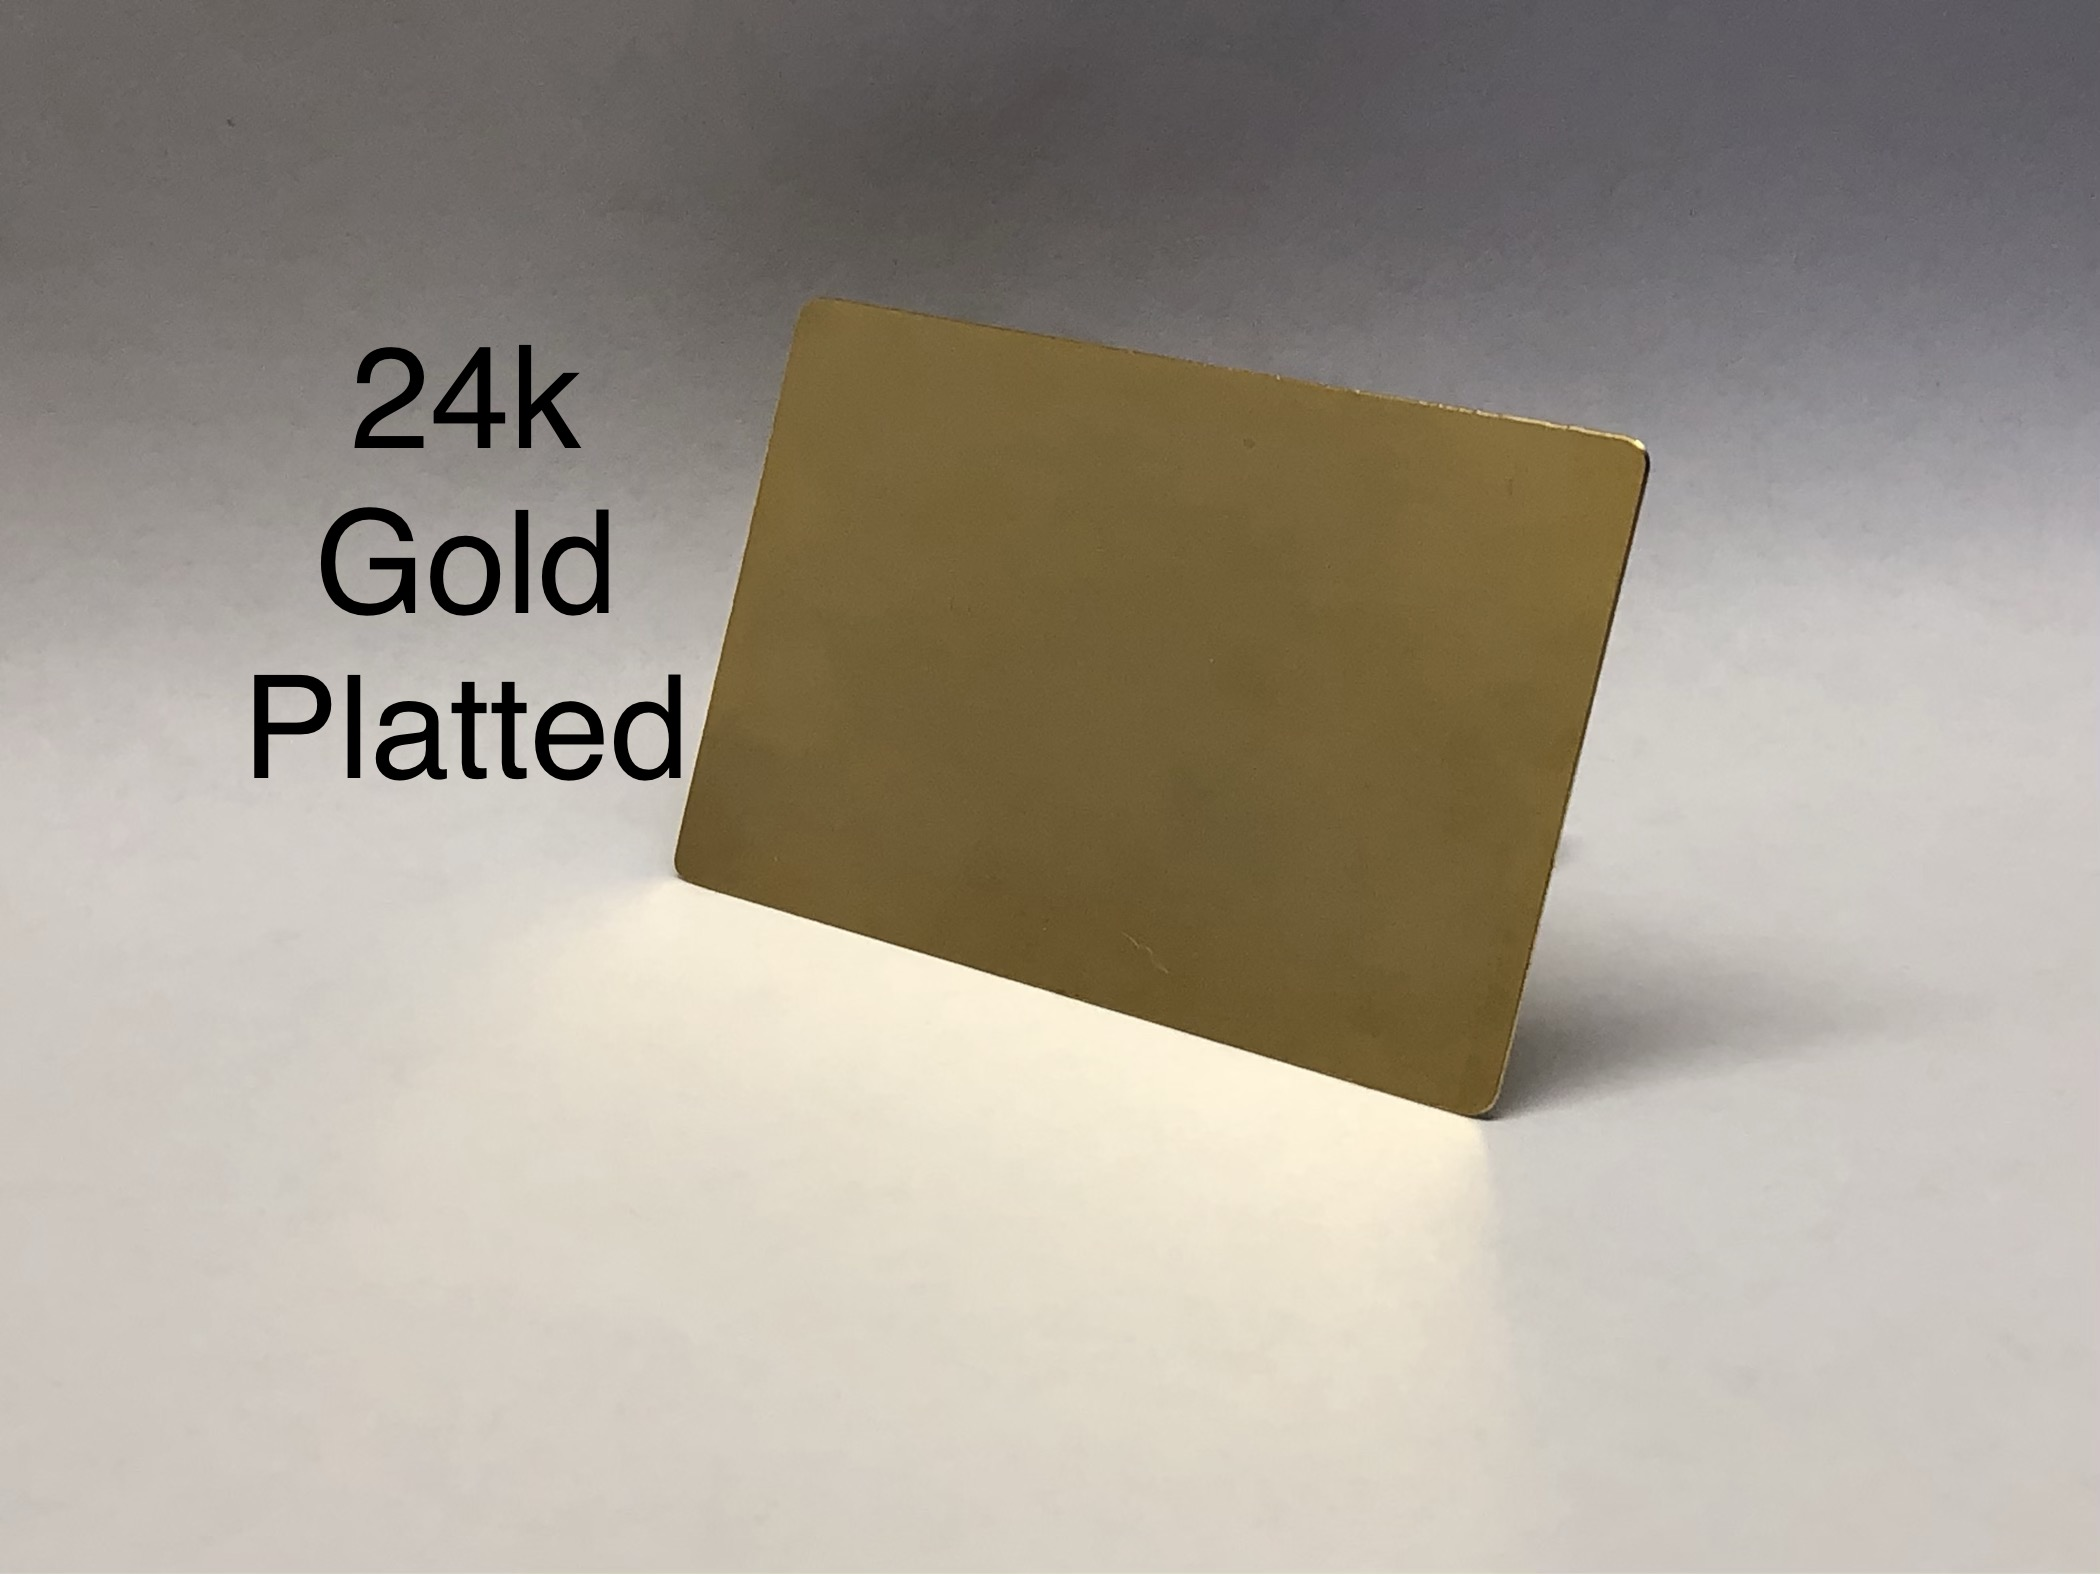 Custom 24k Gold Plated Cards